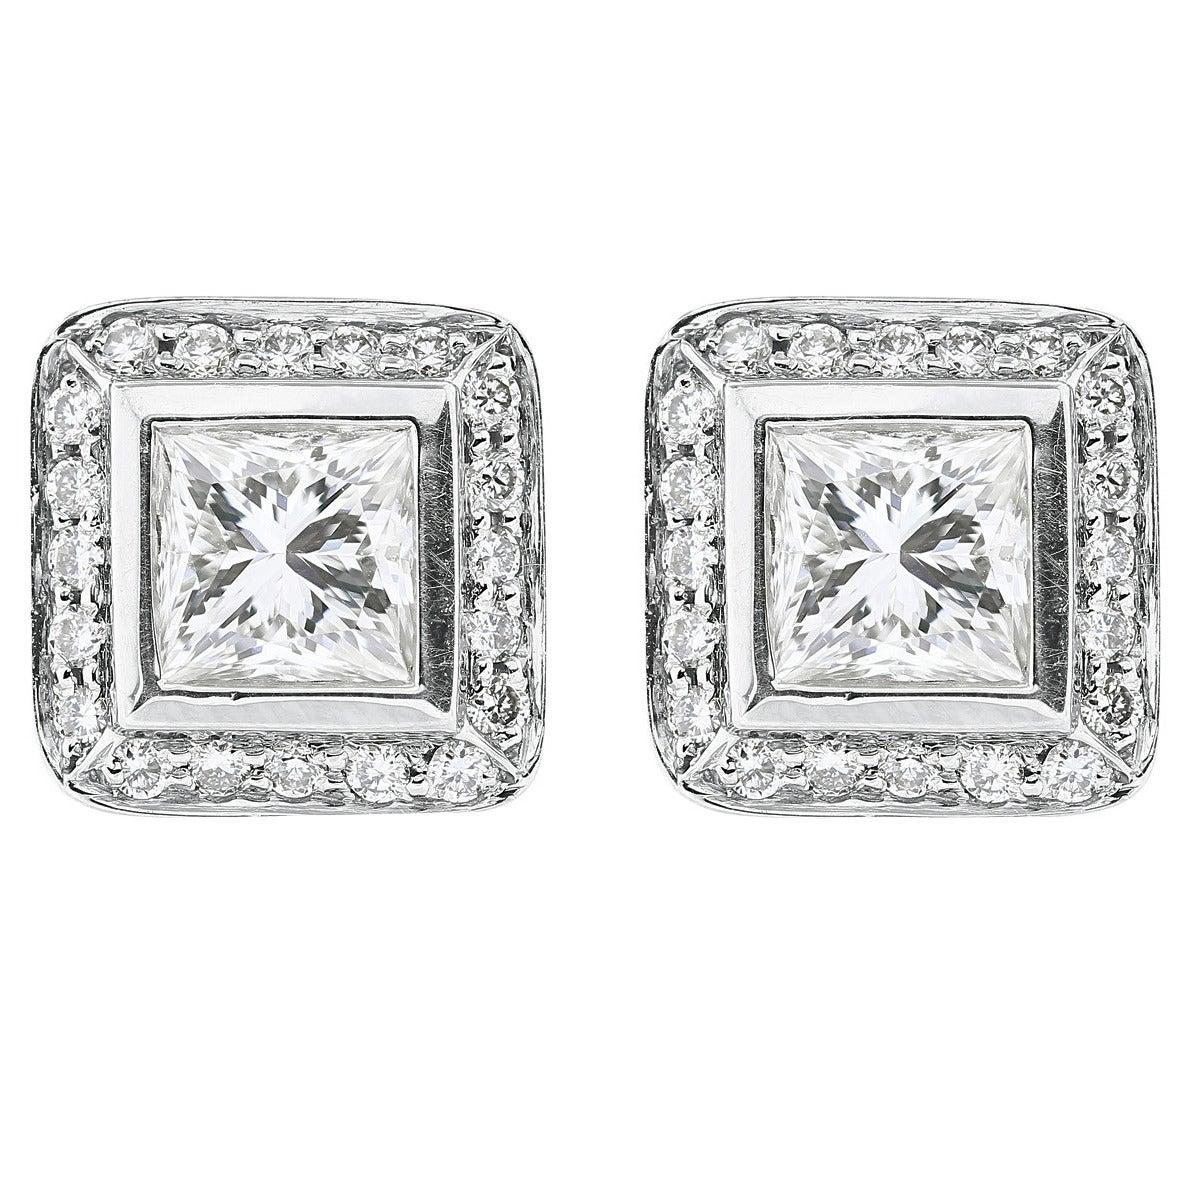 1.01 Carat Princess Cut Diamond Platinum Stud Earrings